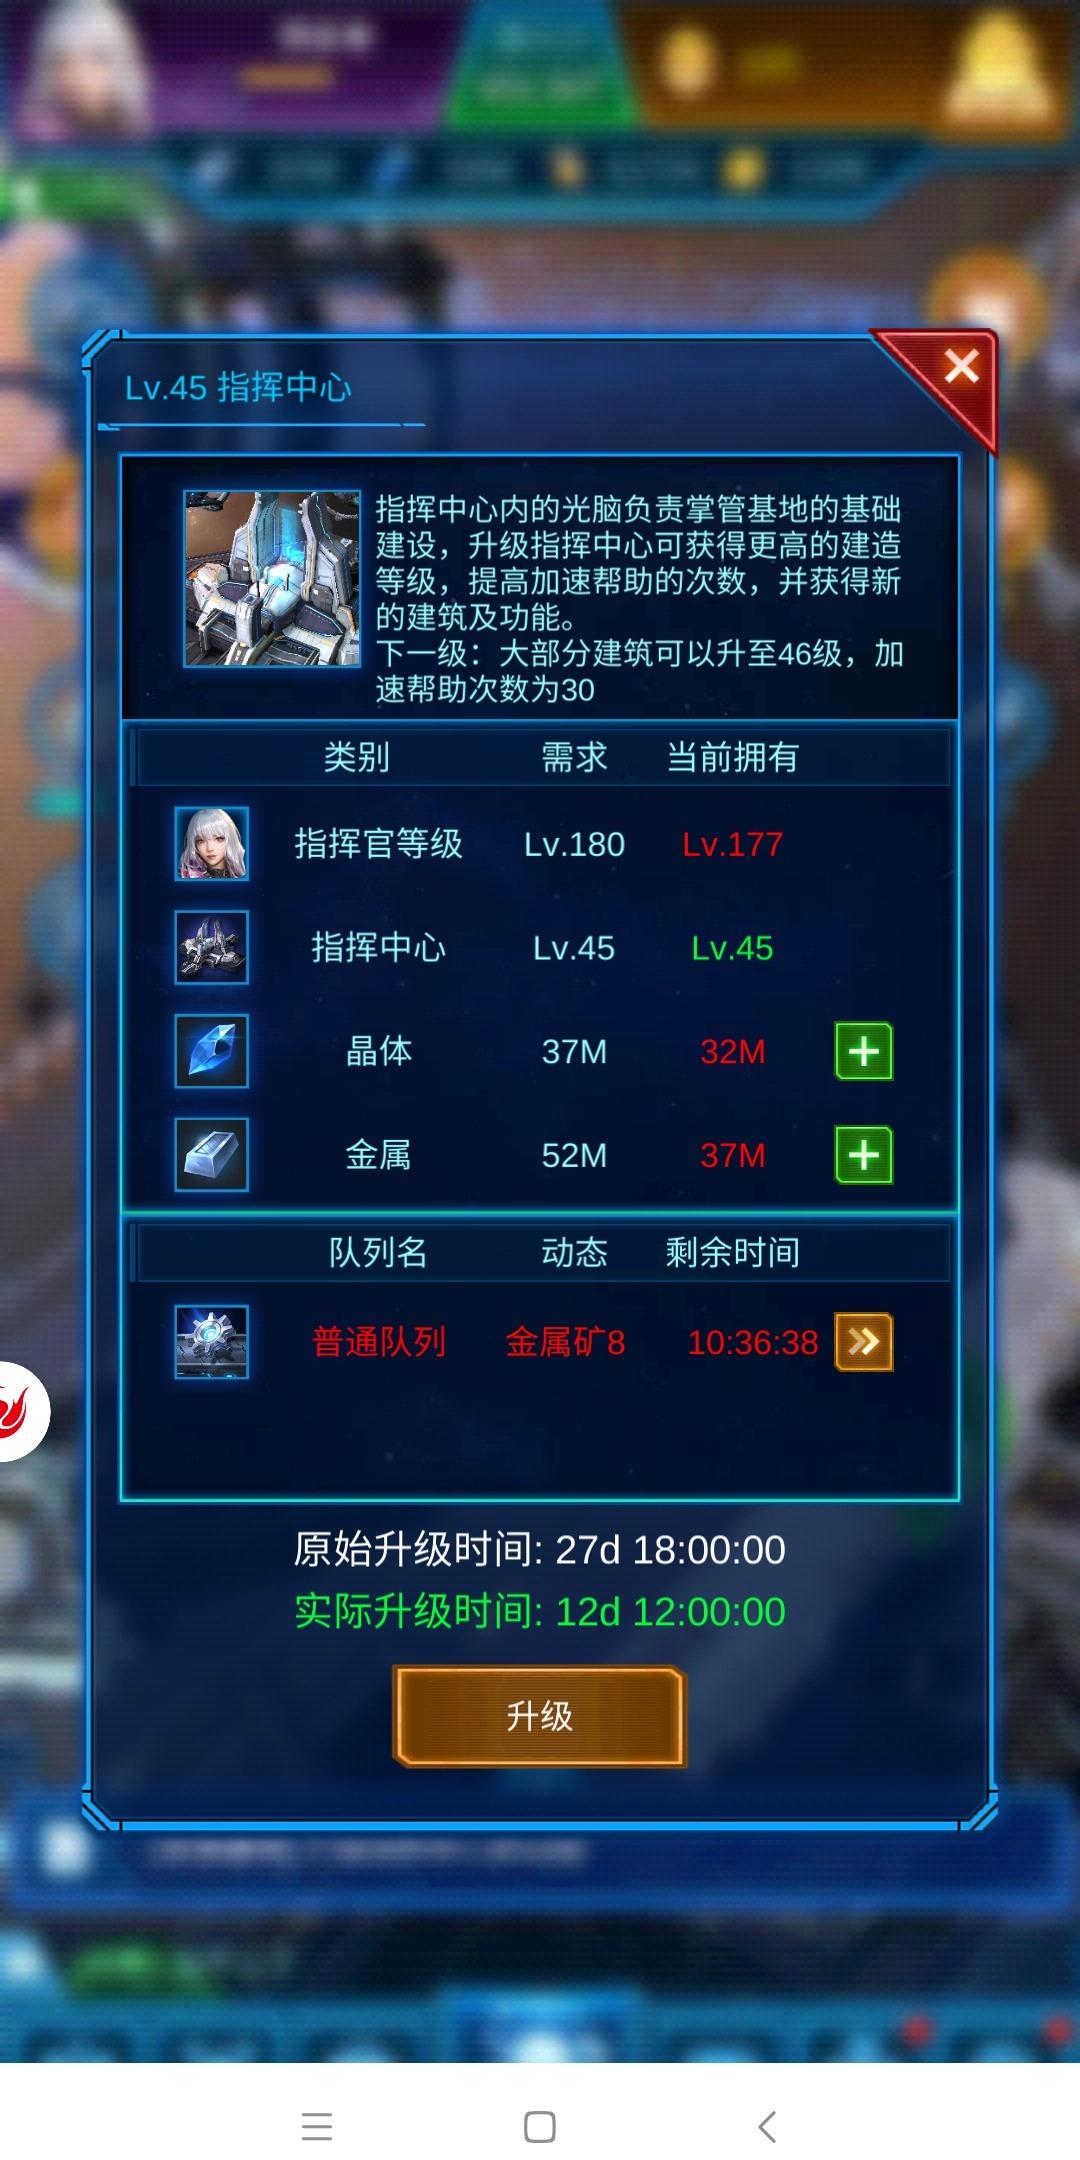 Screenshot_2020-04-15-05-54-16-558_com.jedigames.p16s.luobo.jpg